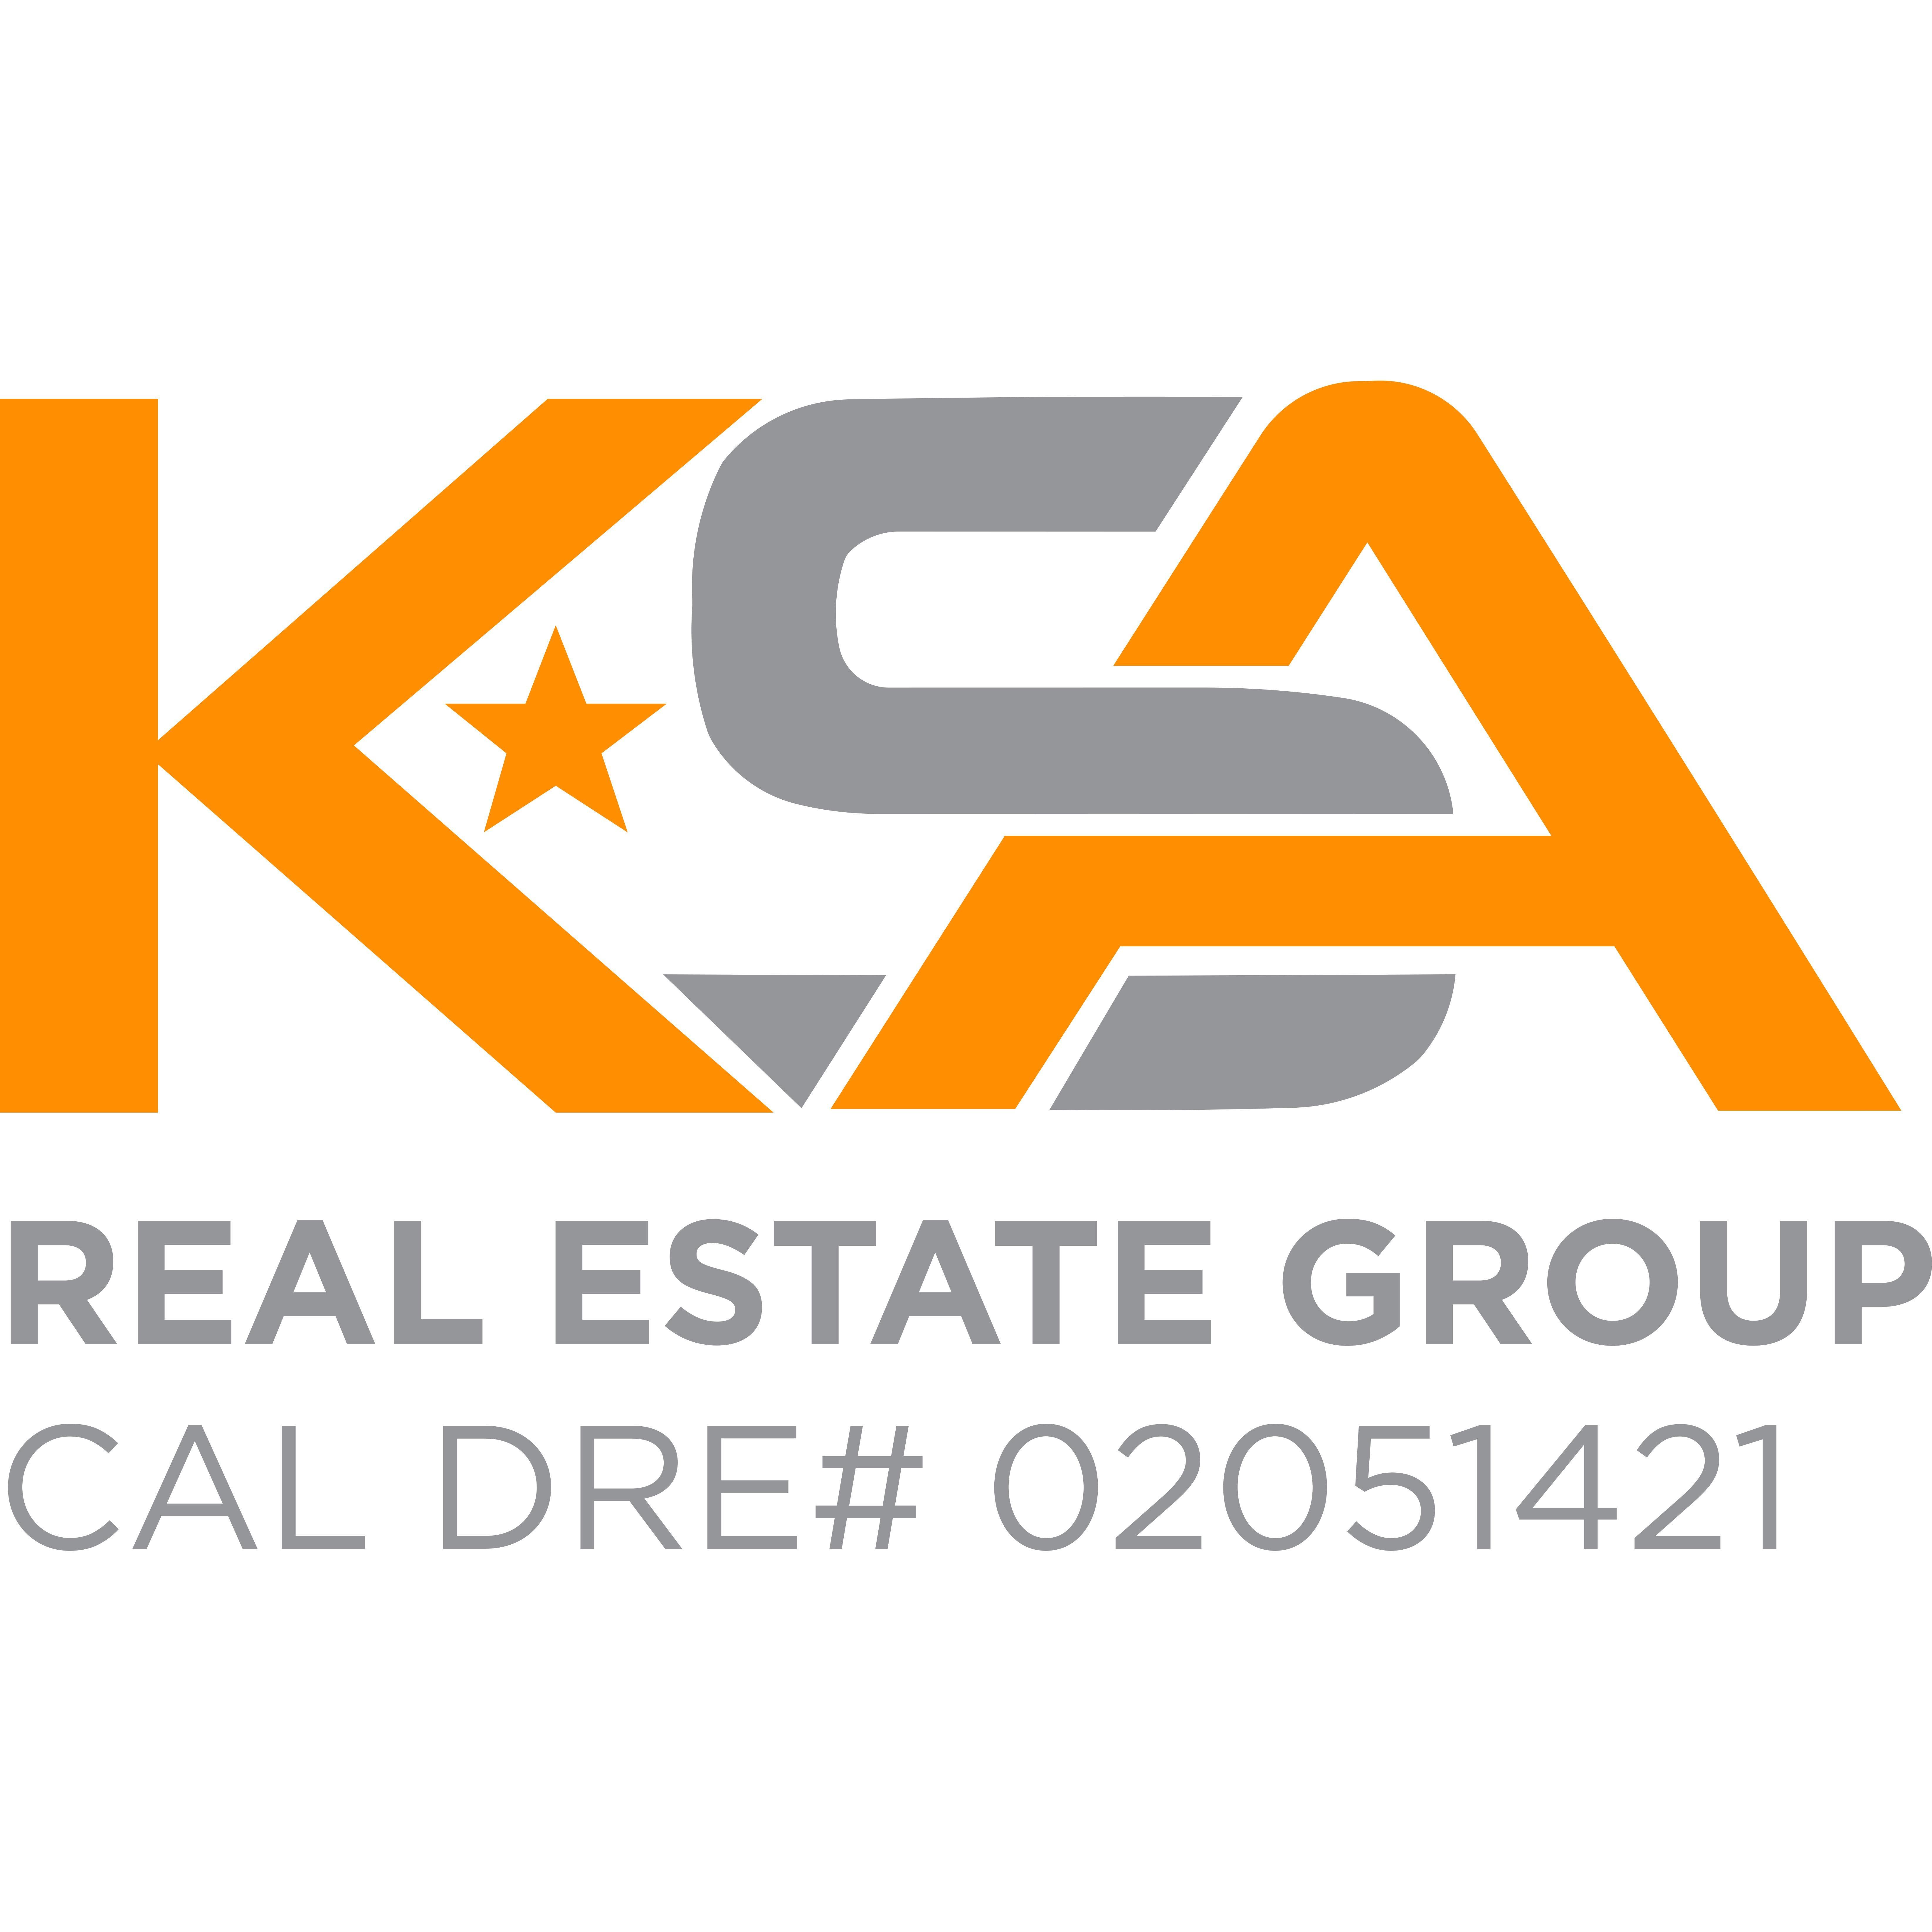 KSA Real Estate Group